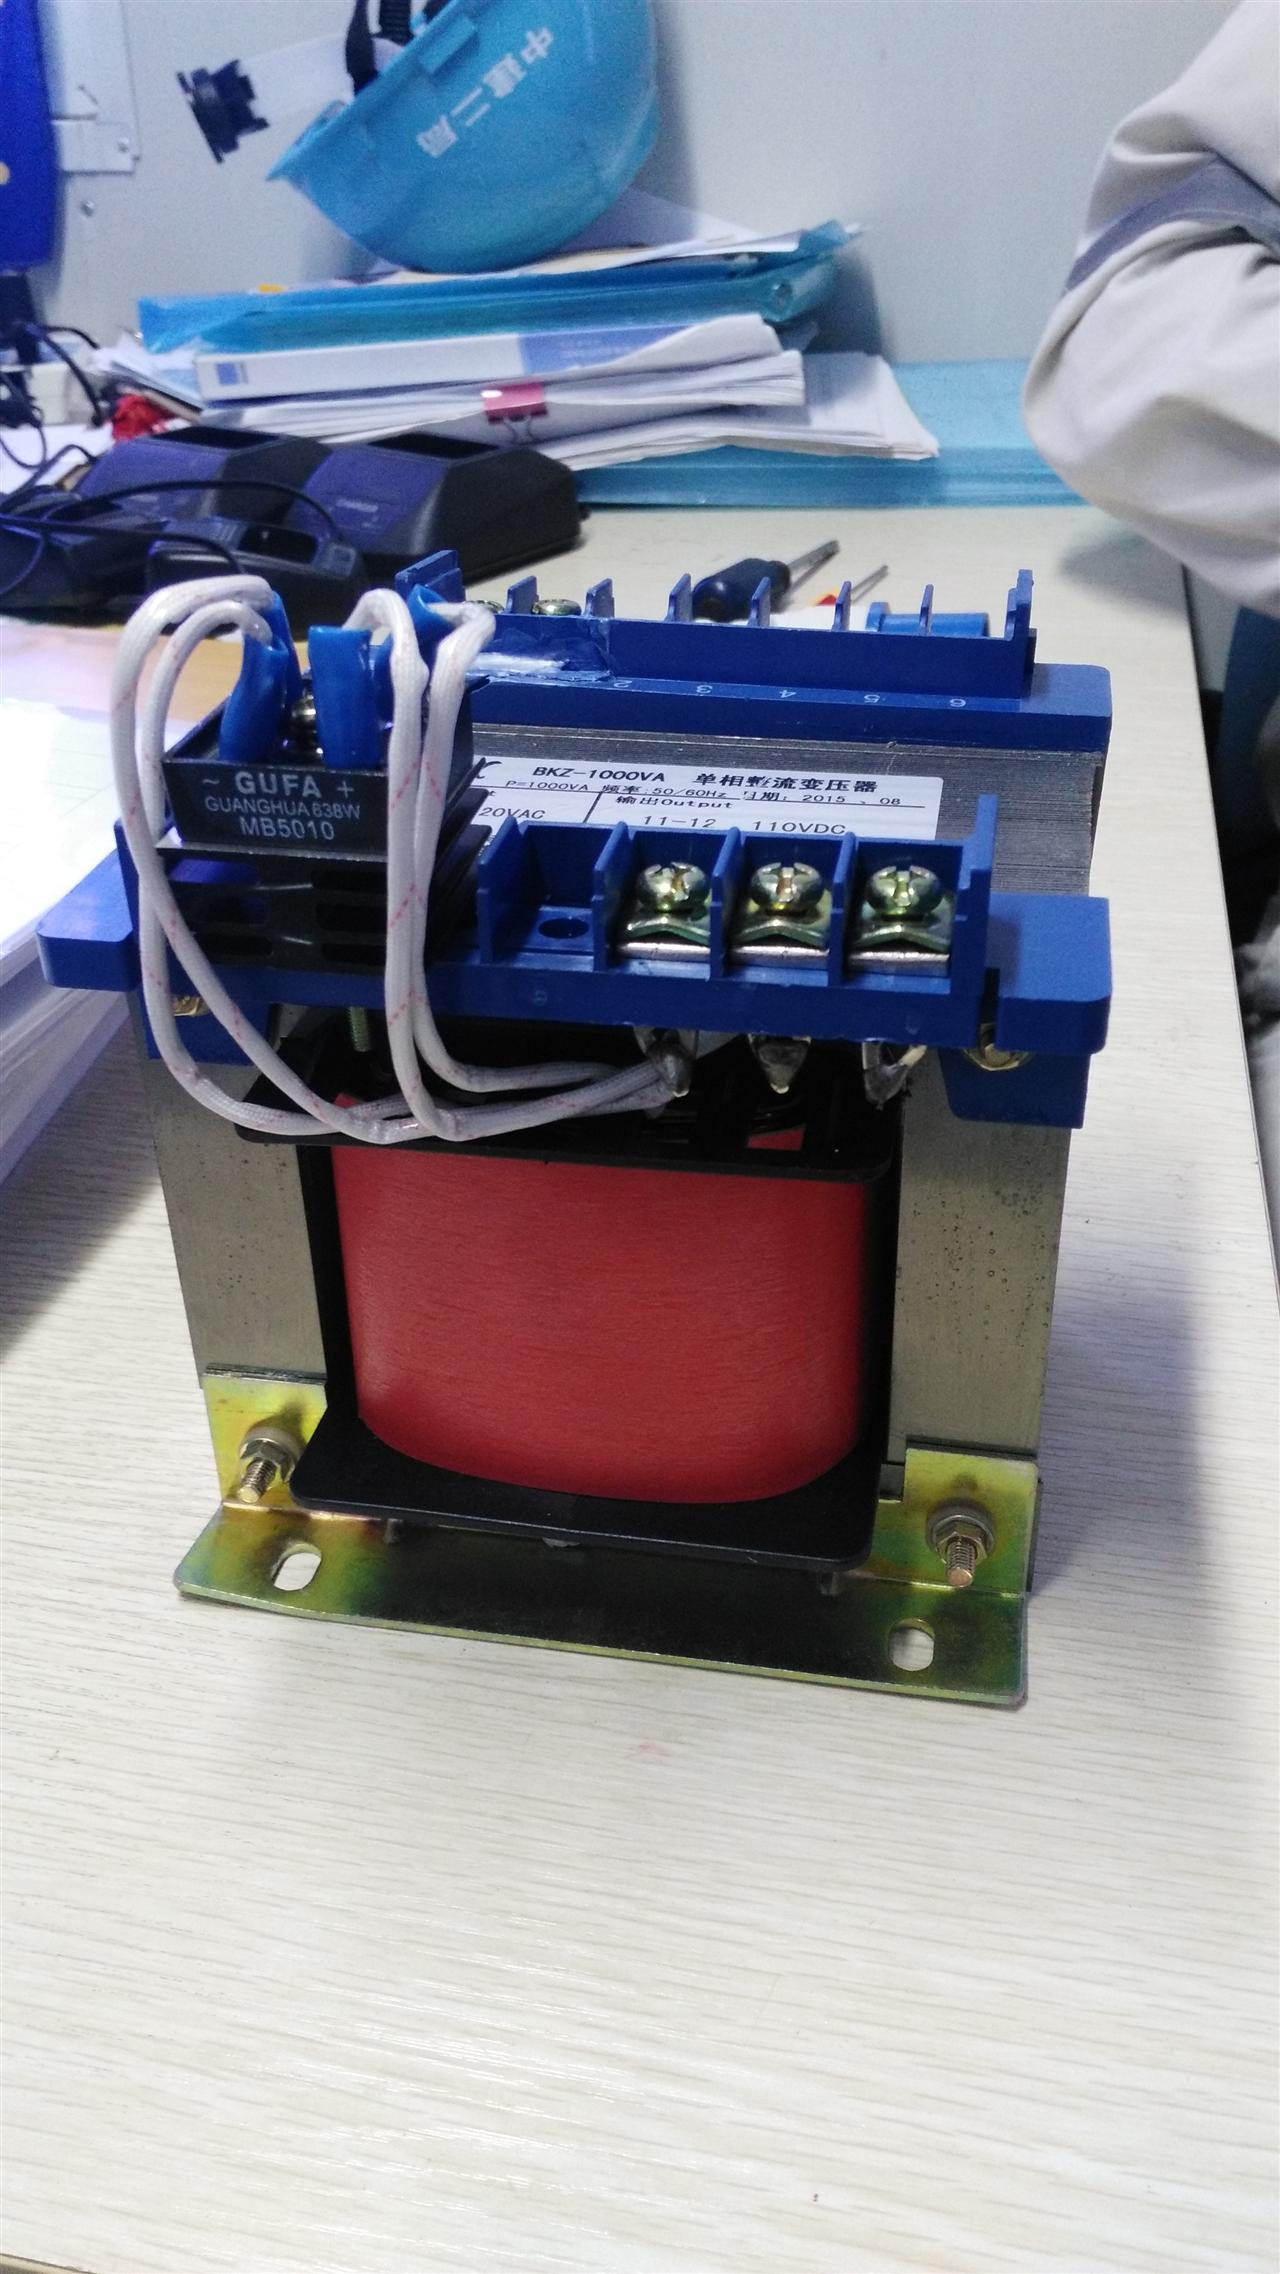 BKZ-850VA/850W380V mootor DC60V ühefaasiline vahelduvvoolu - alalisvoolu trafode parandamine